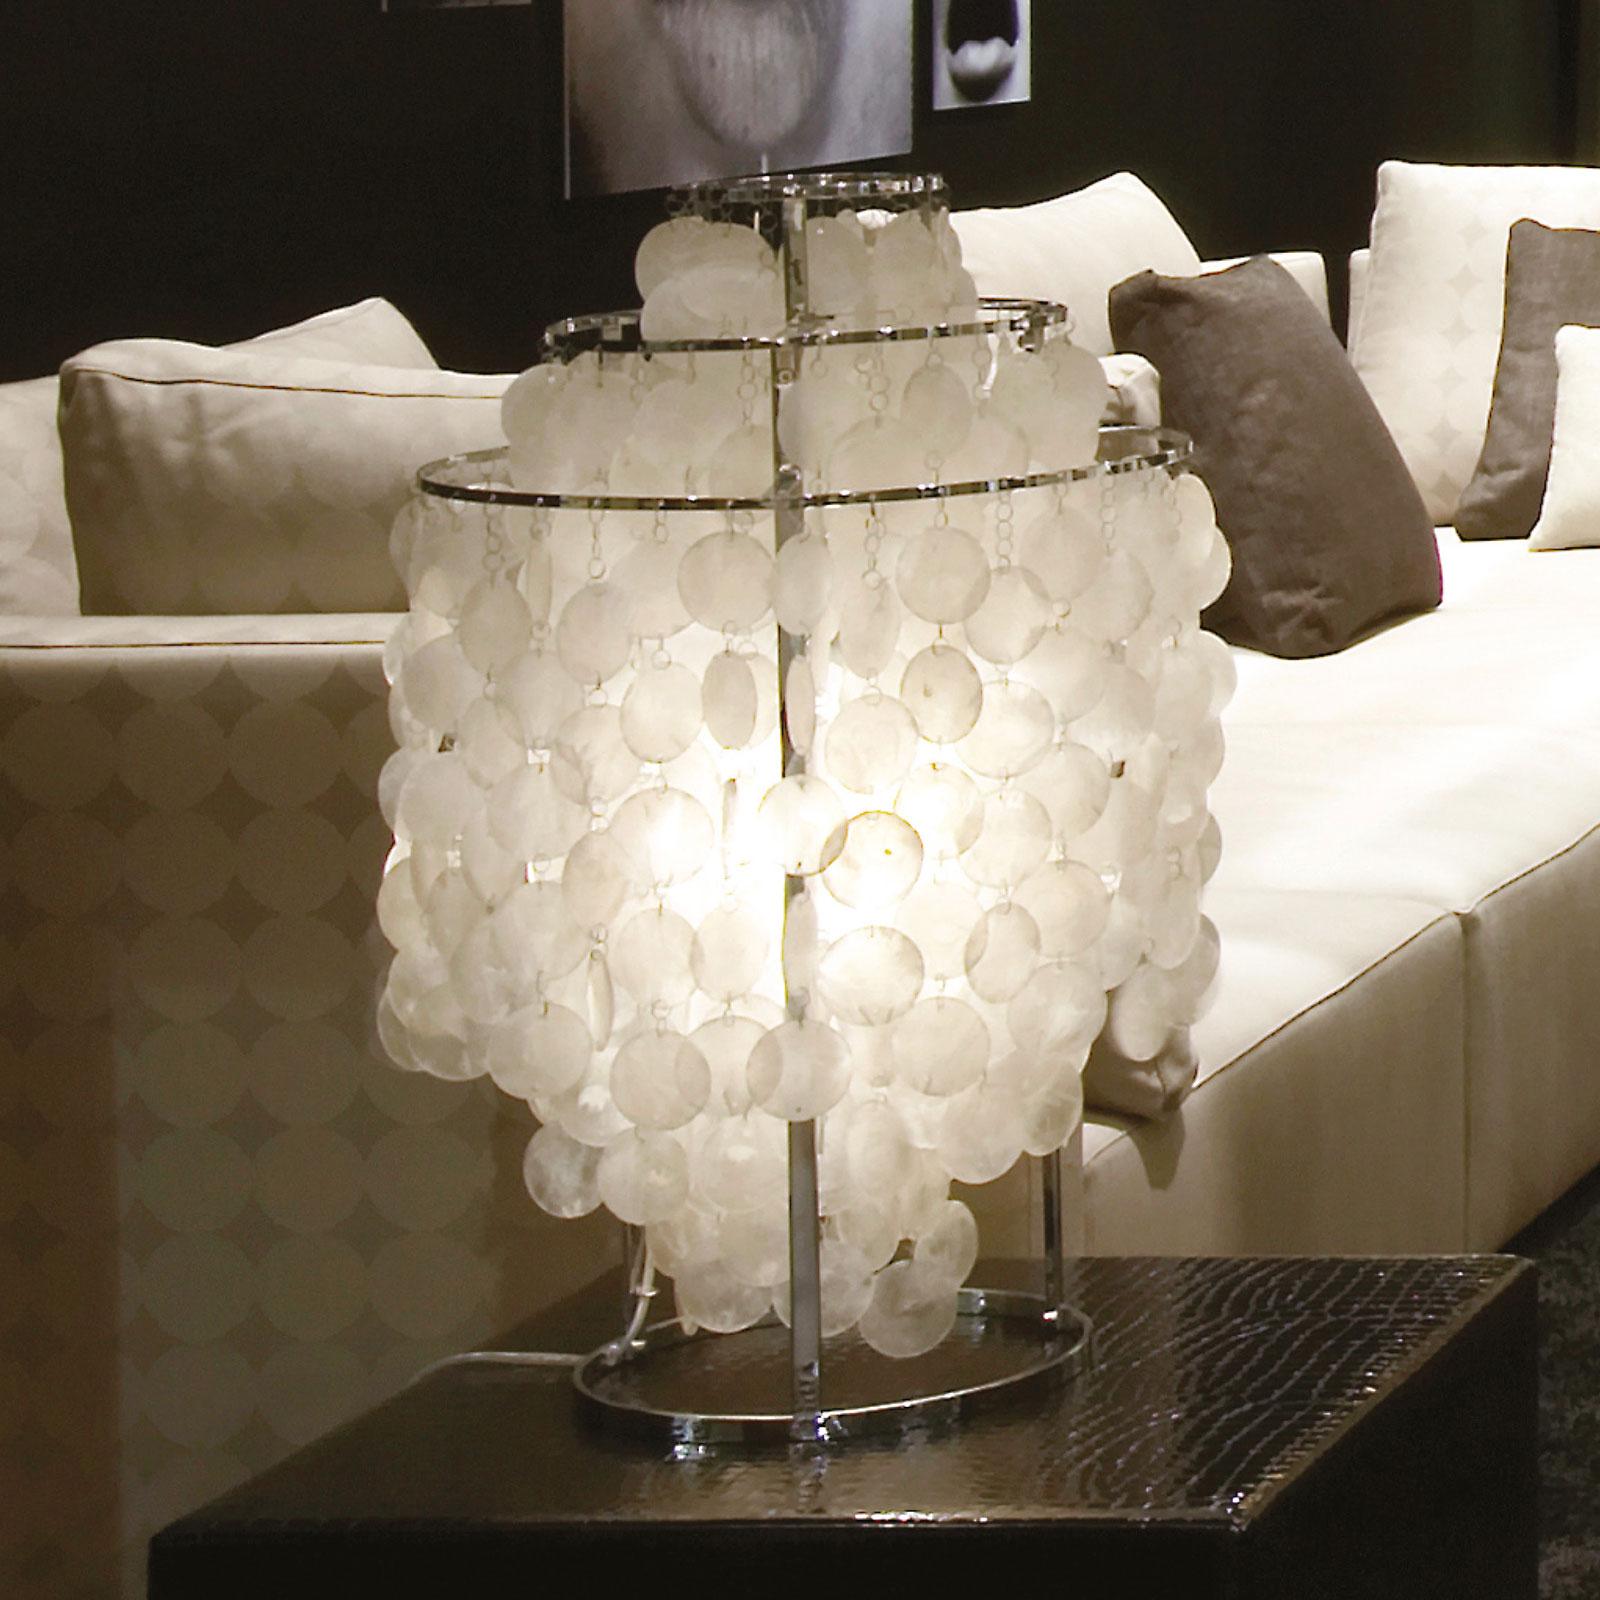 VERPAN Fun 2TM - lampe à poser nacre, chromée